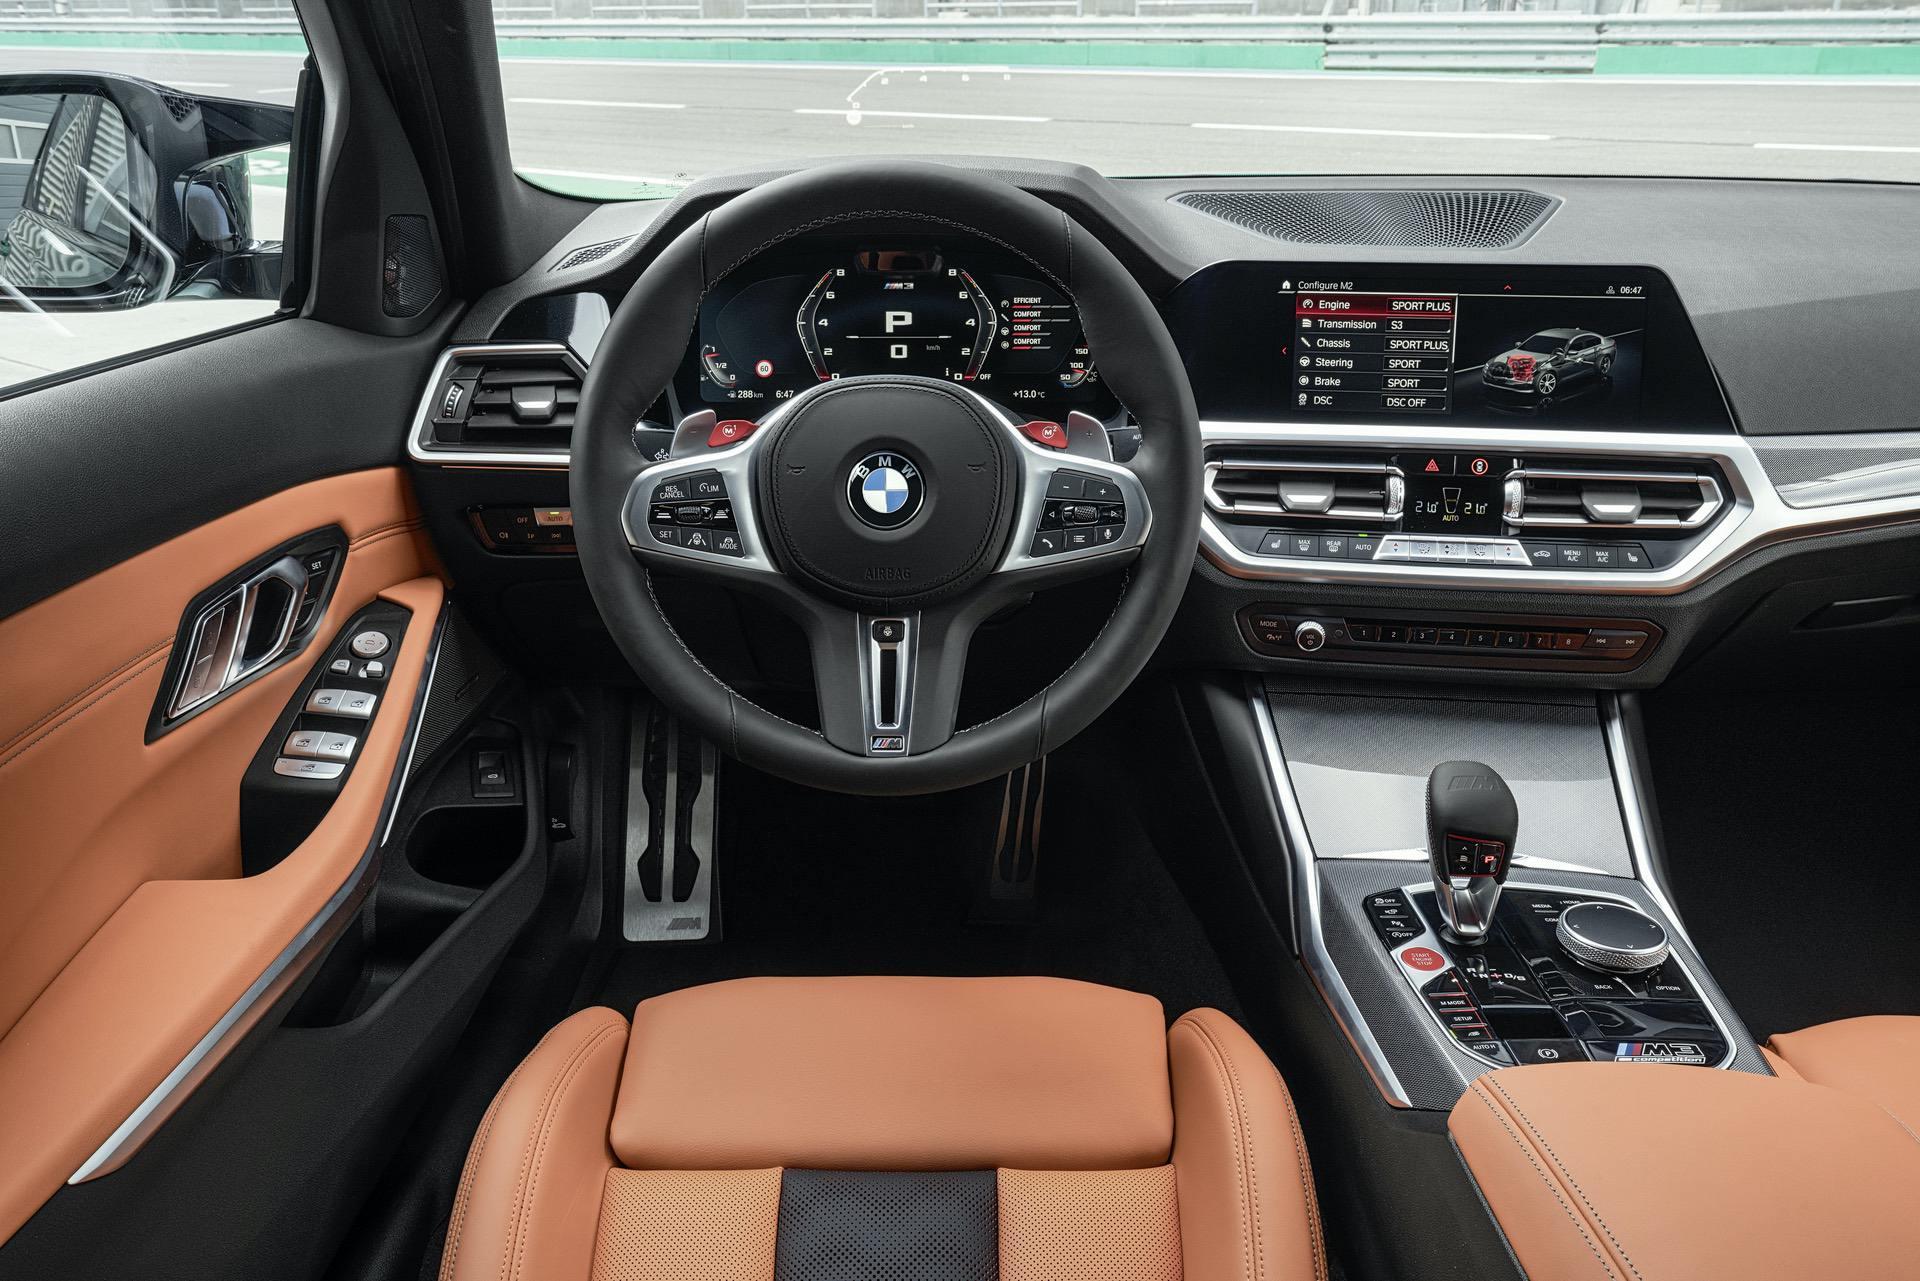 2021-bmw-m3-competition-interior-00.jpg